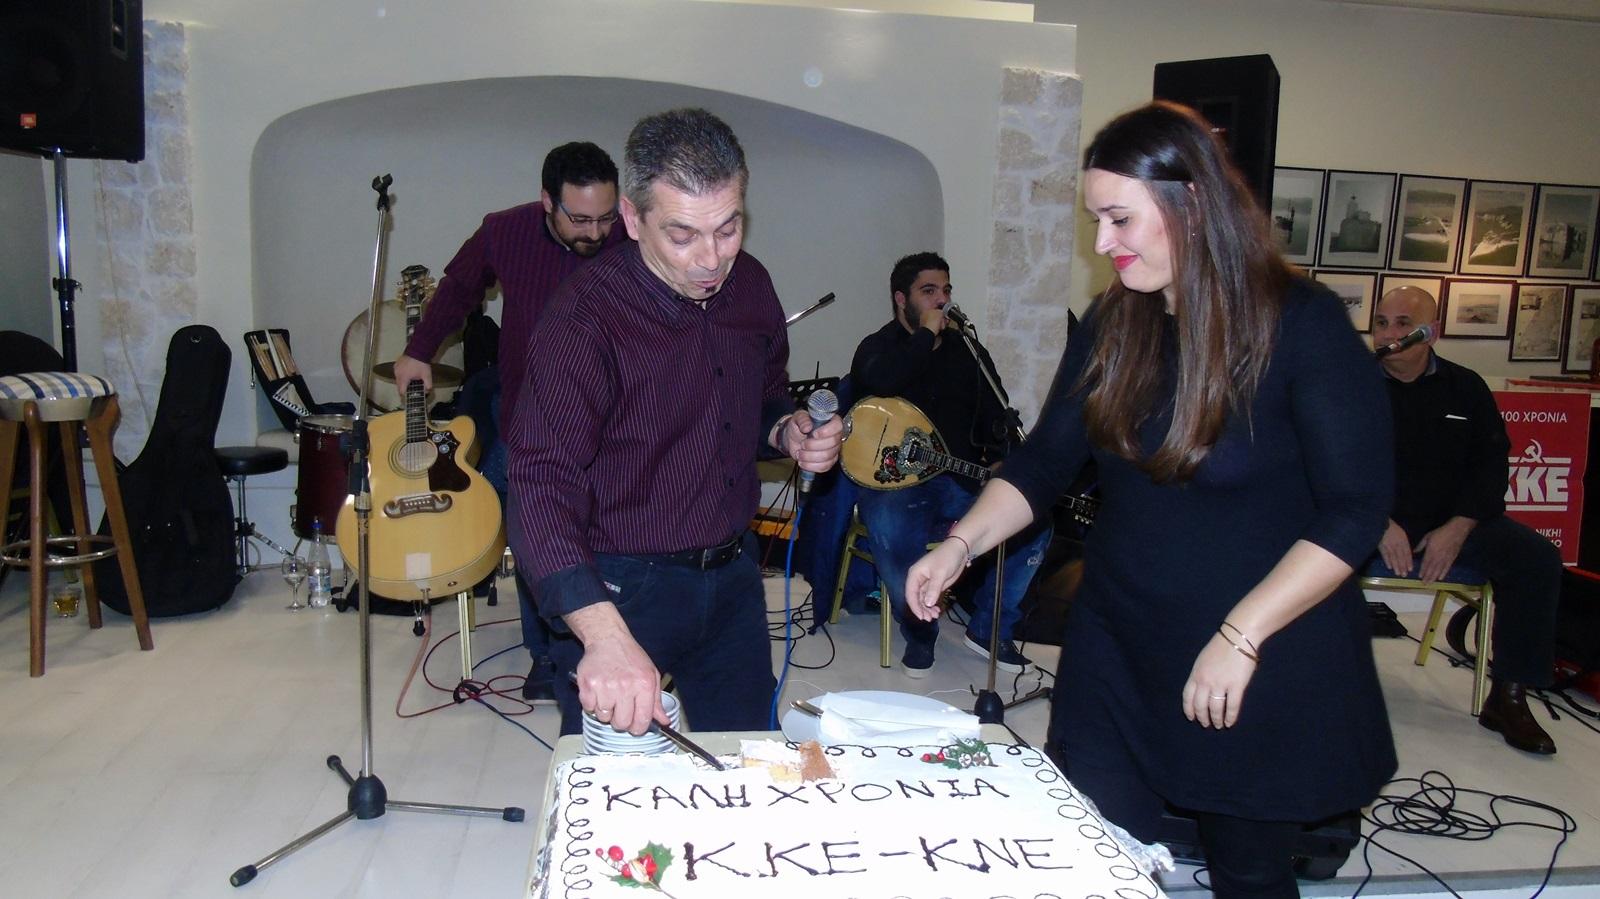 23_xoros_KKE_2019